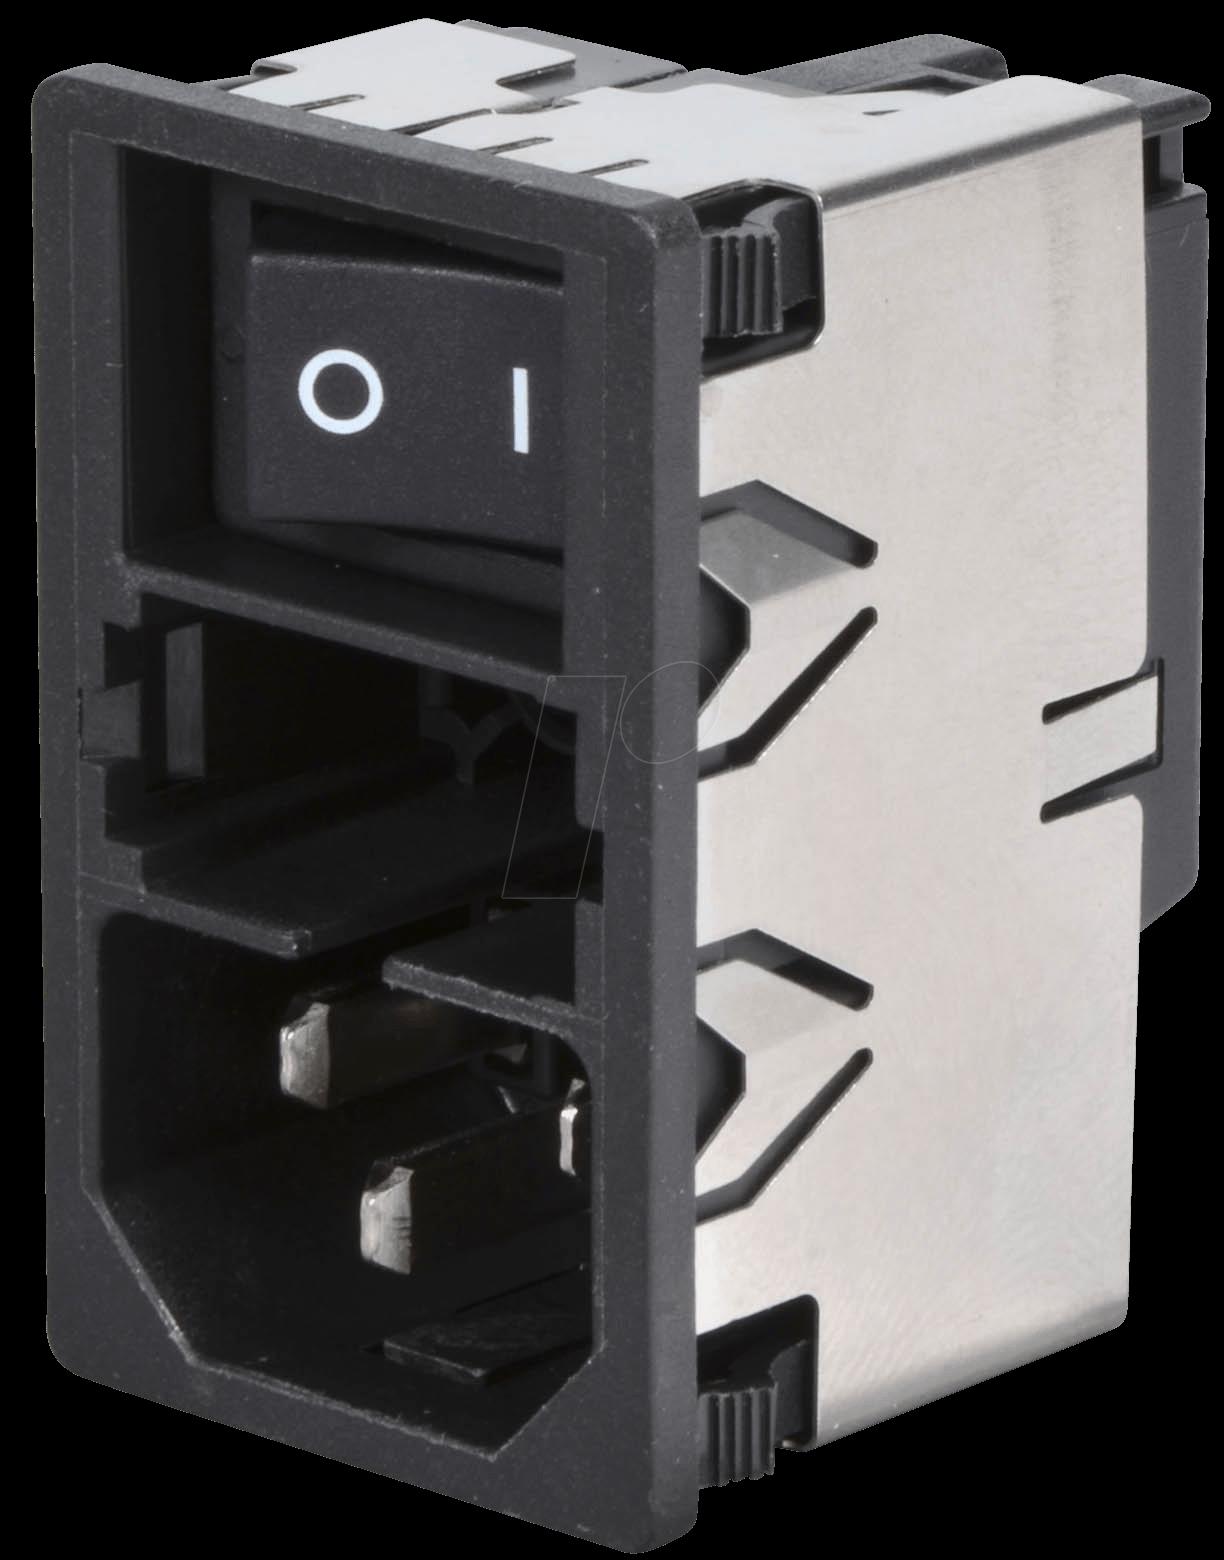 km kombi stecker sicherung netzschalter 2 polig bei reichelt elektronik. Black Bedroom Furniture Sets. Home Design Ideas